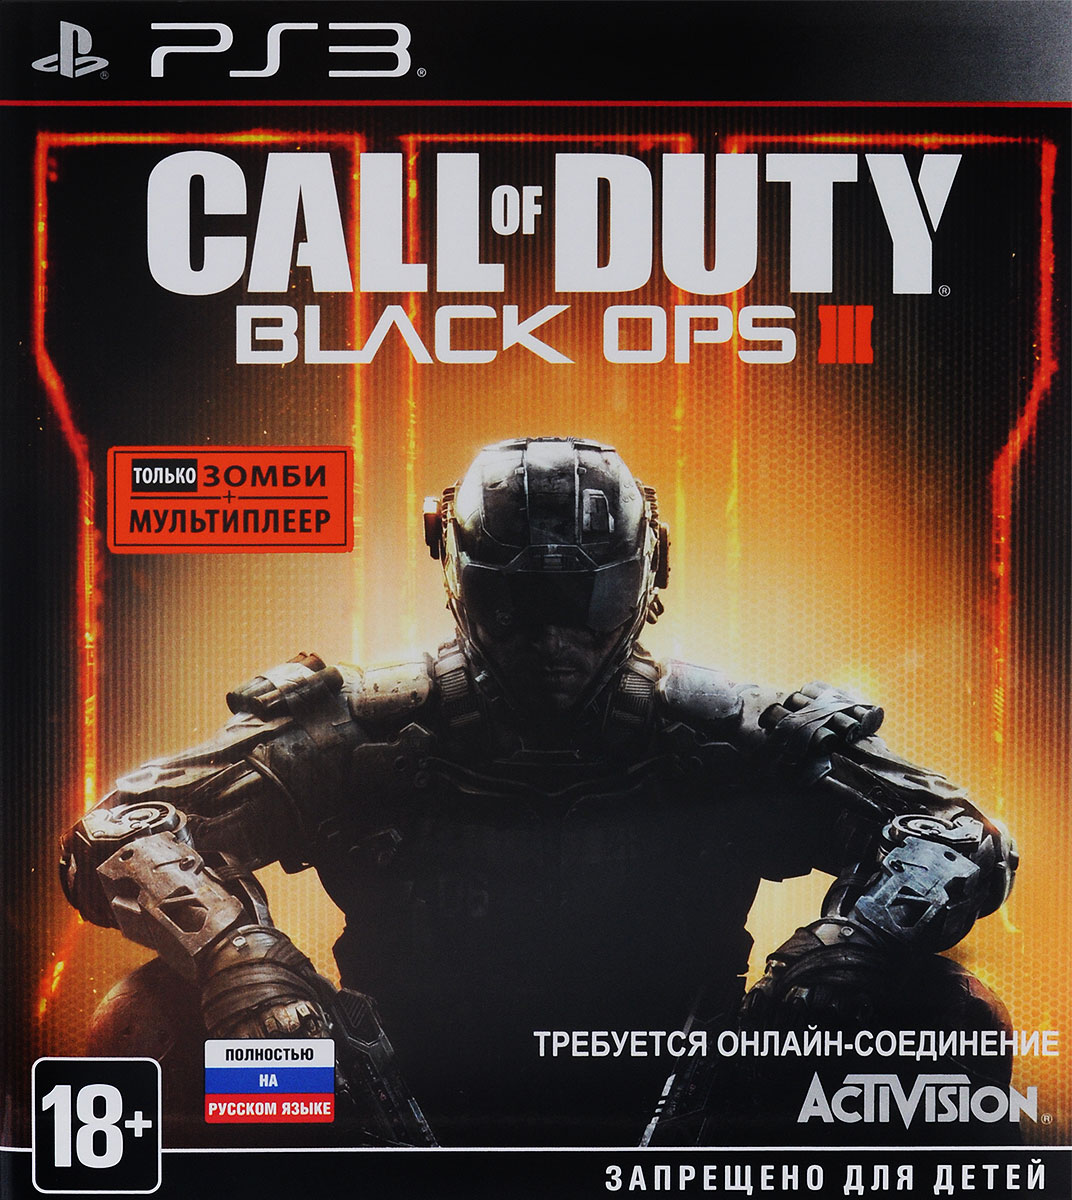 Call of Duty: Black Ops III (PS3) call of duty black ops iii ps3